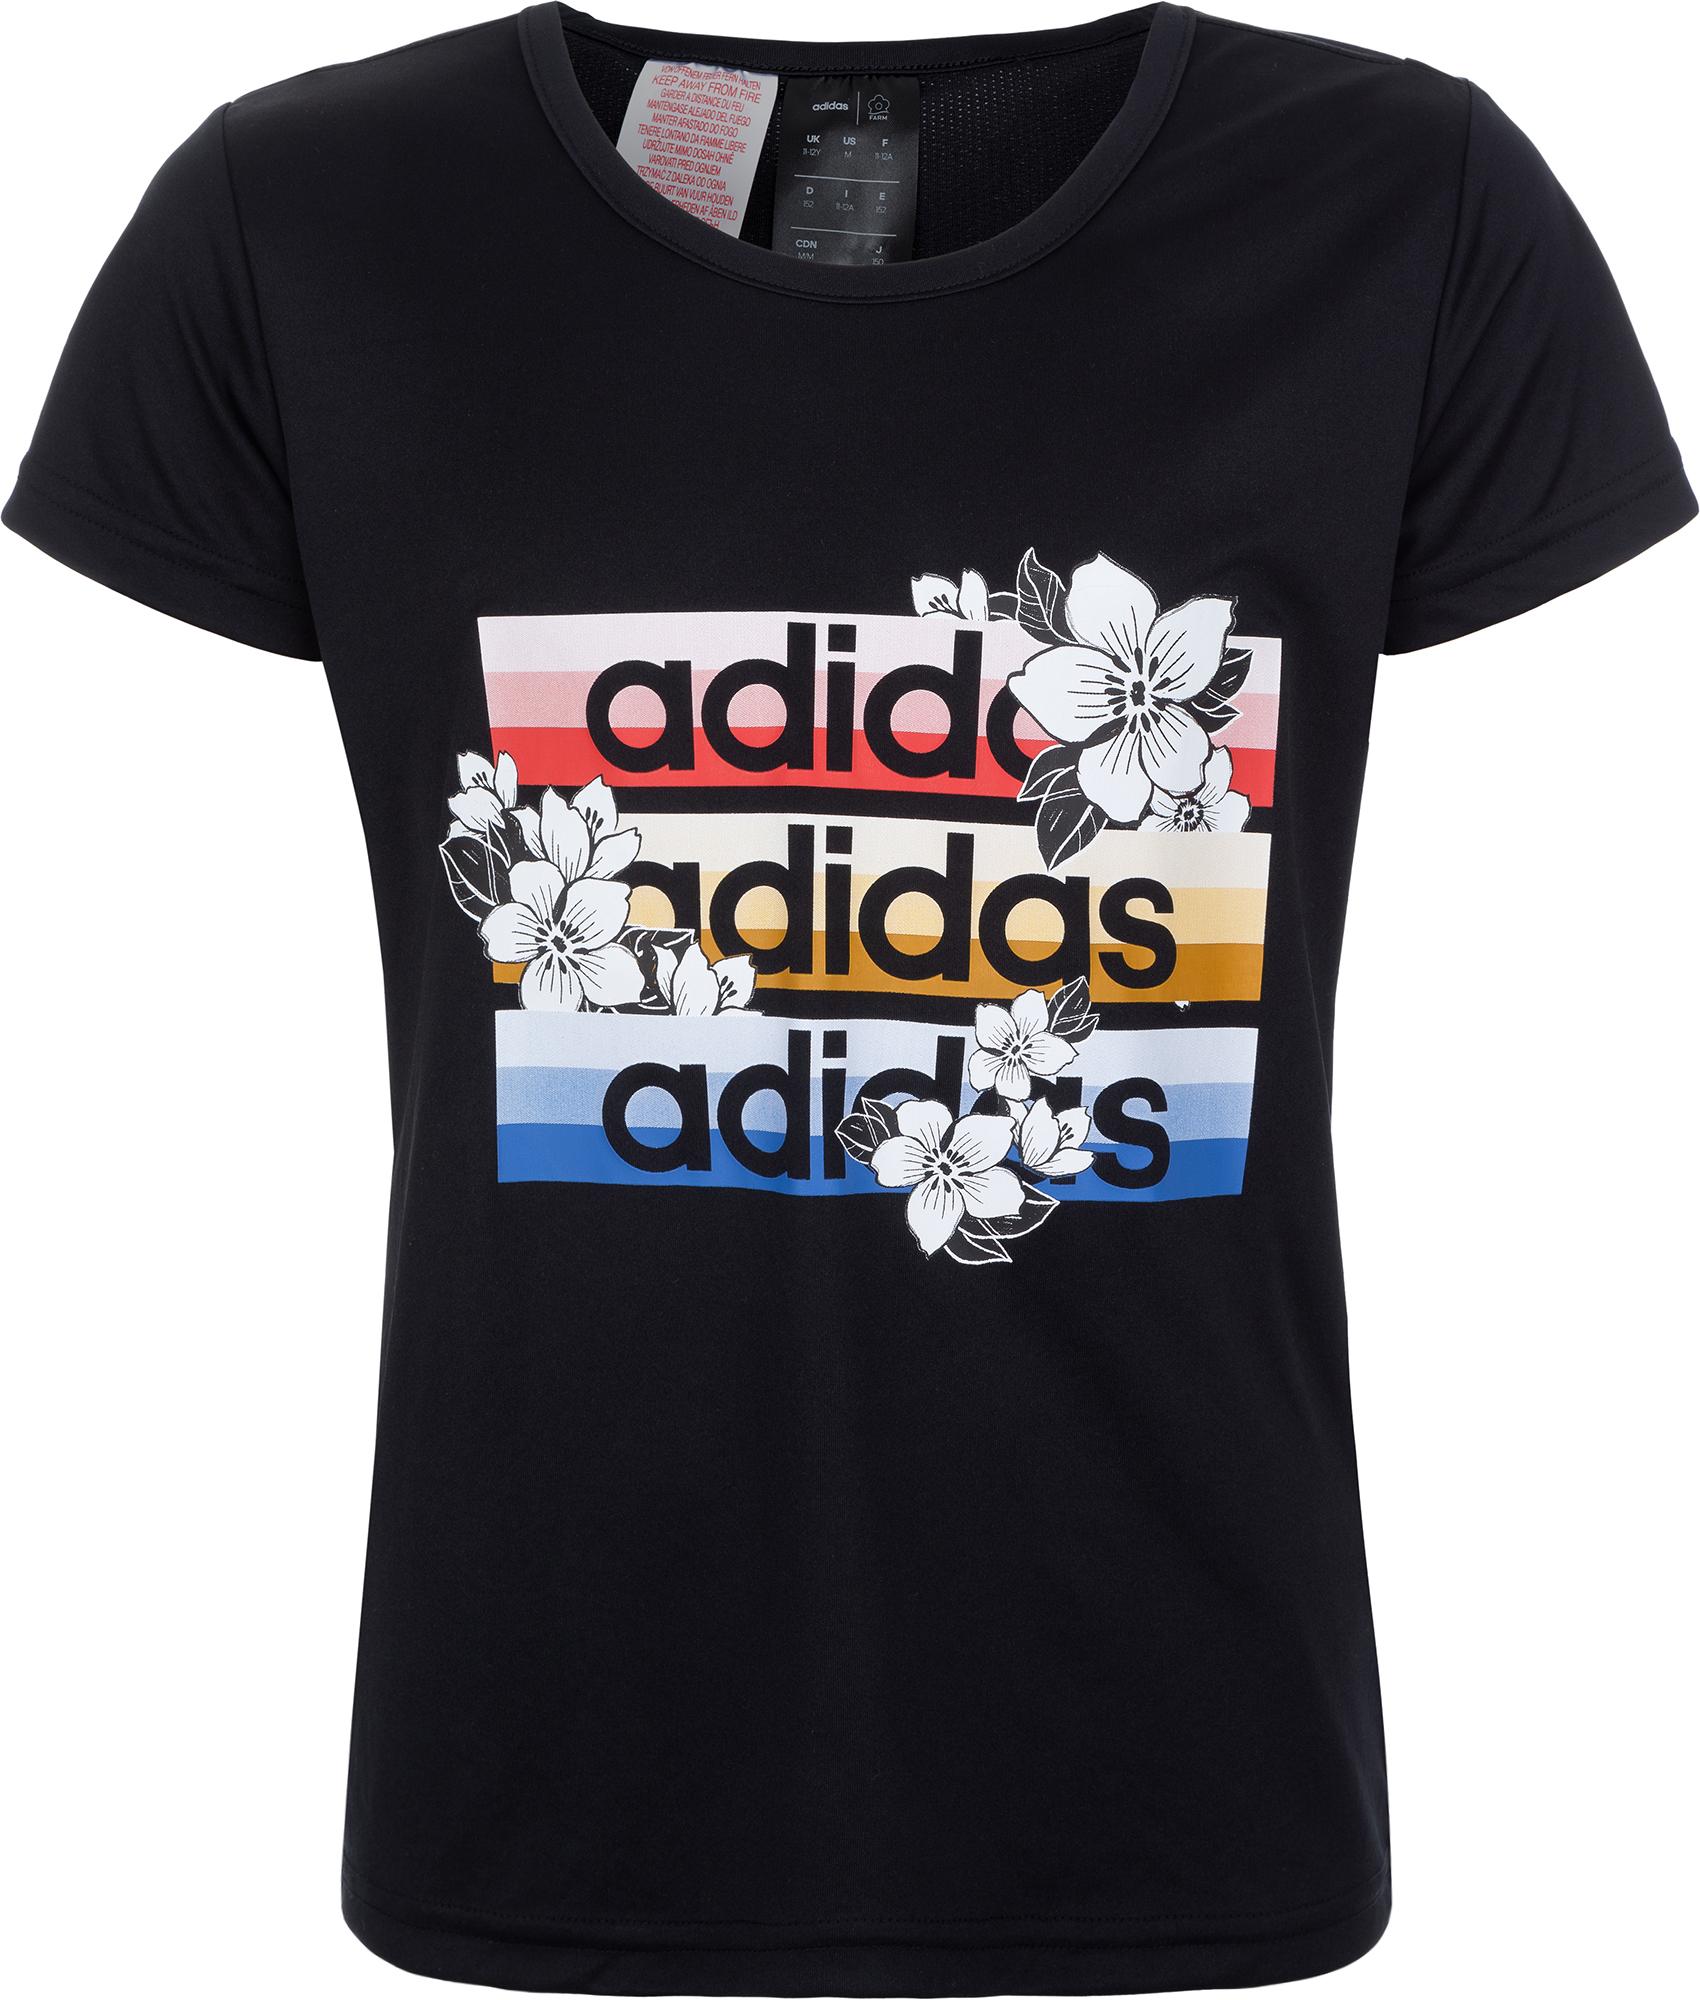 Adidas Футболка для девочек FARM Rio, размер 170